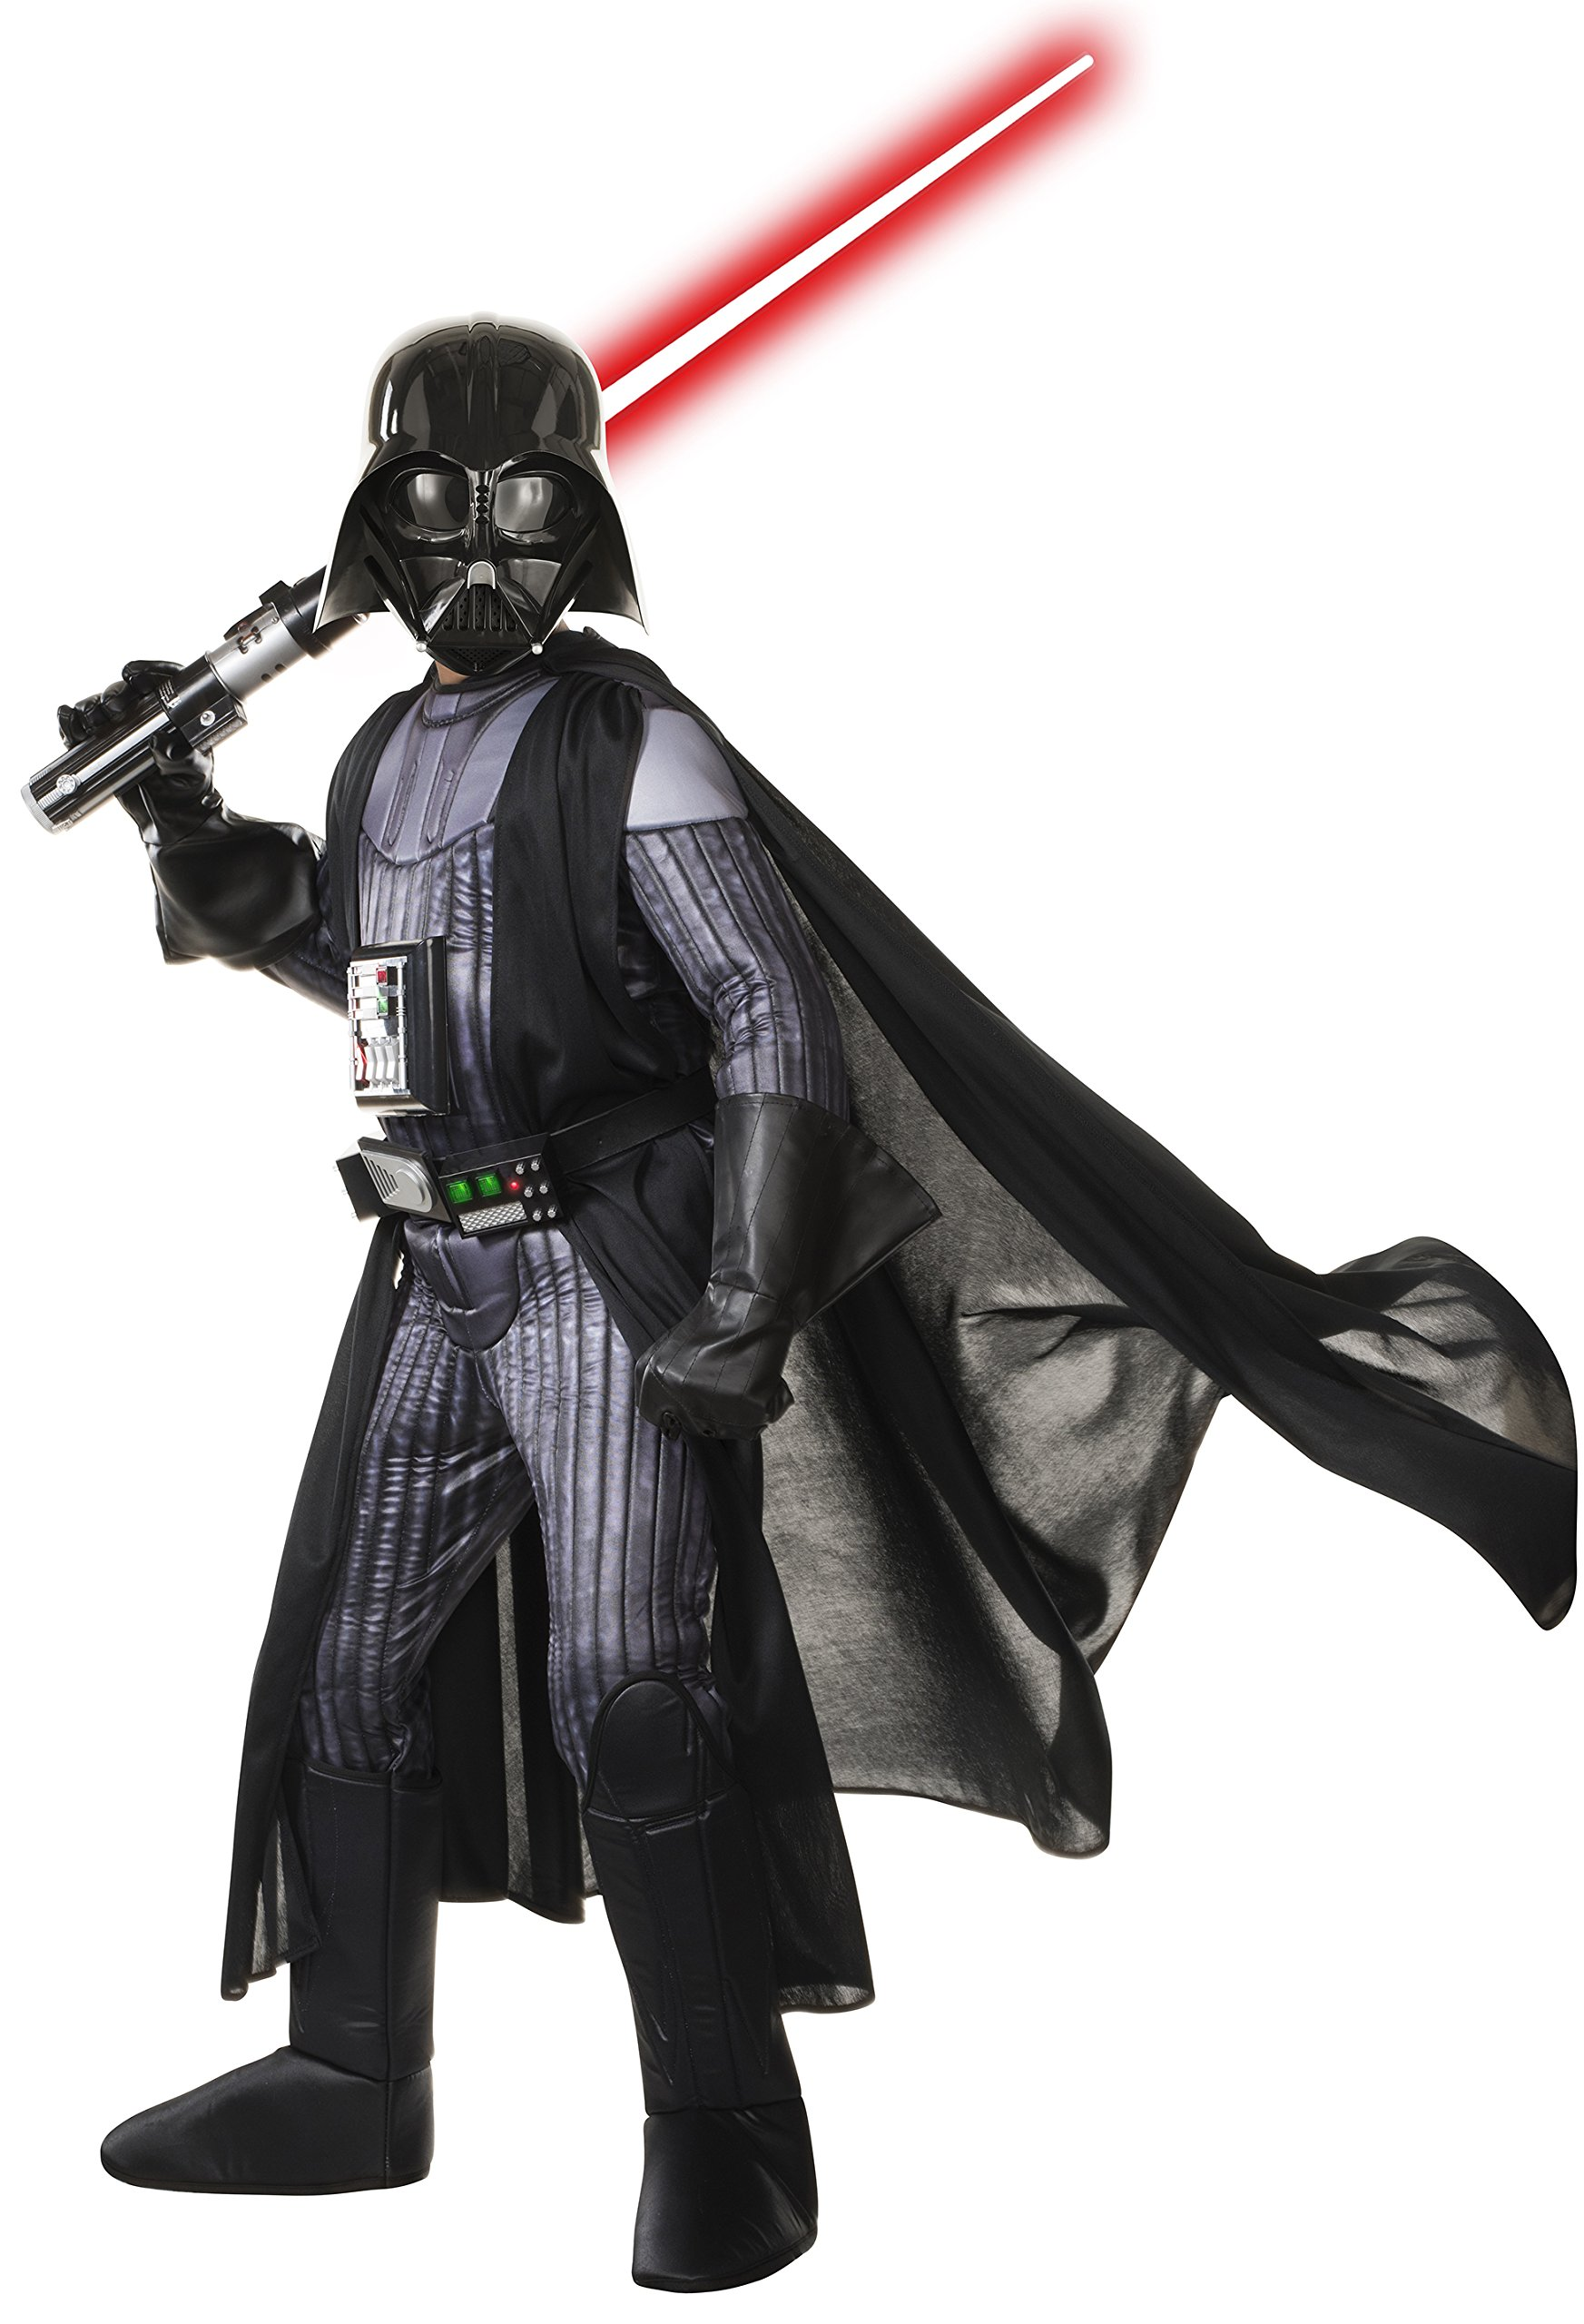 Star Wars Child's Deluxe Darth Vader Costume, Medium